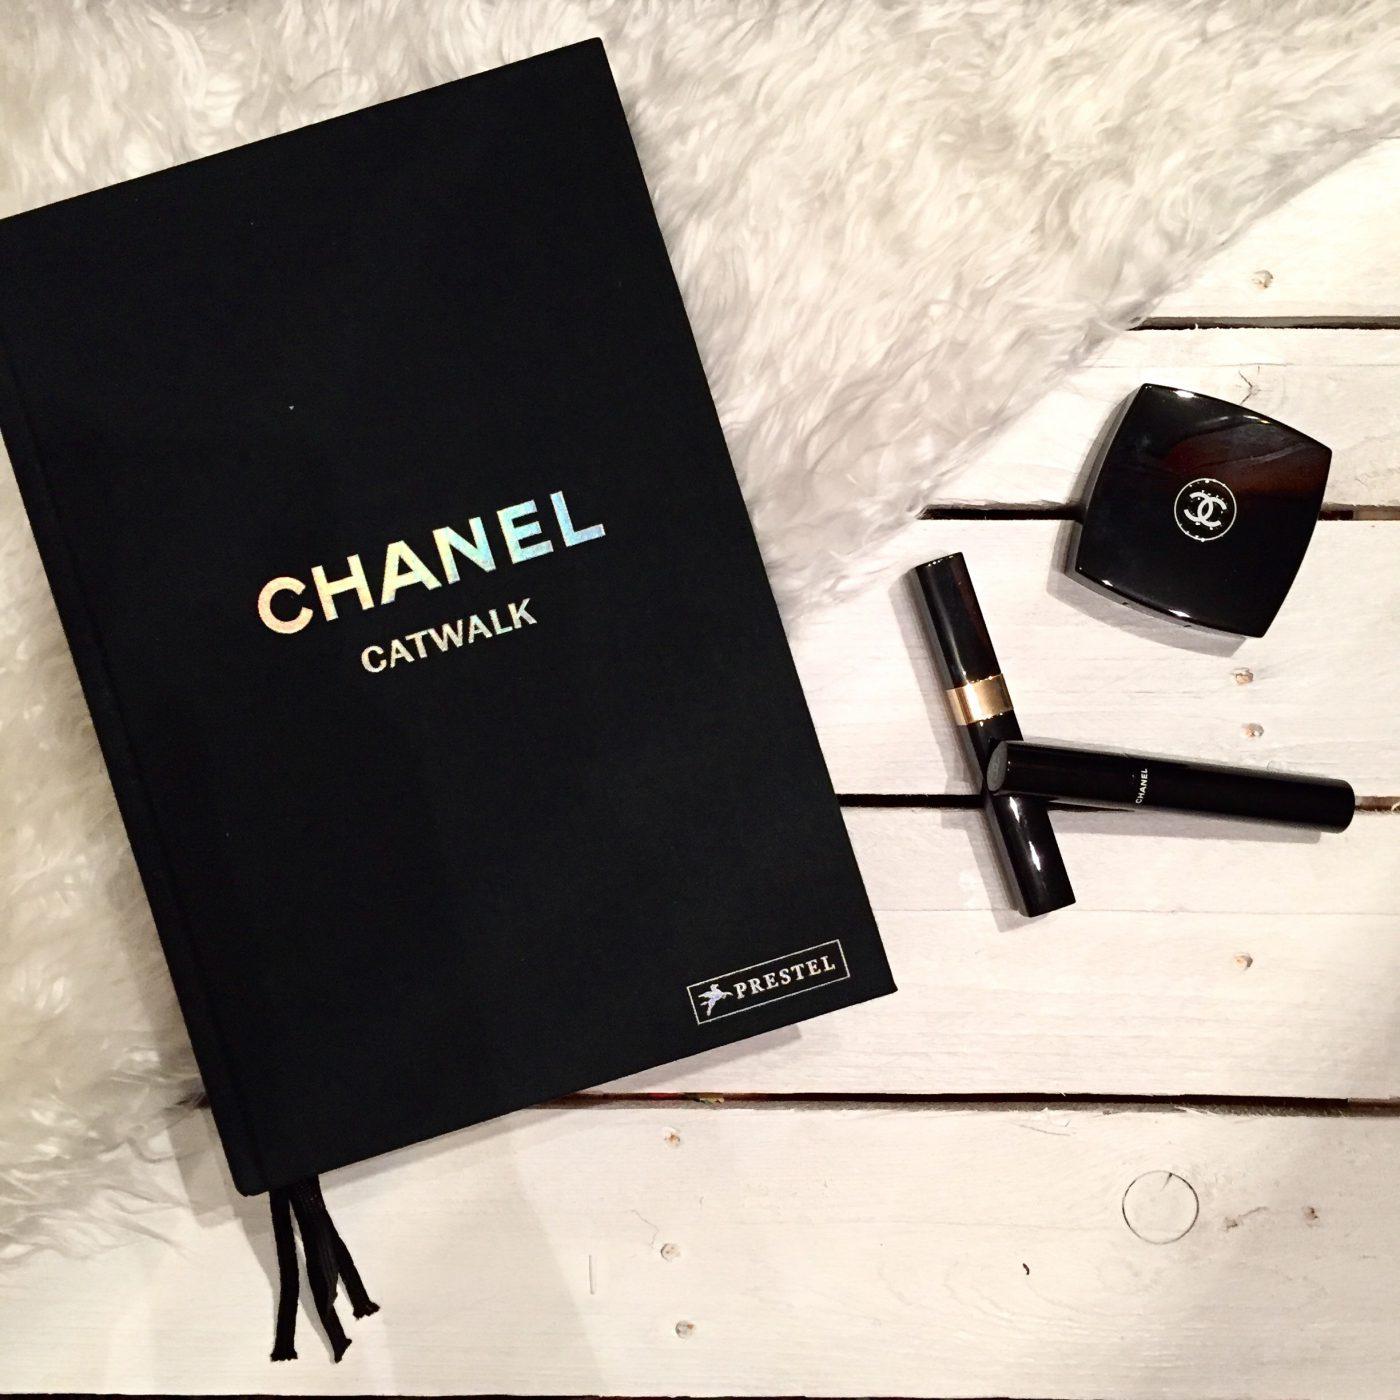 Chanel: Catwalk – Museumlifestyle